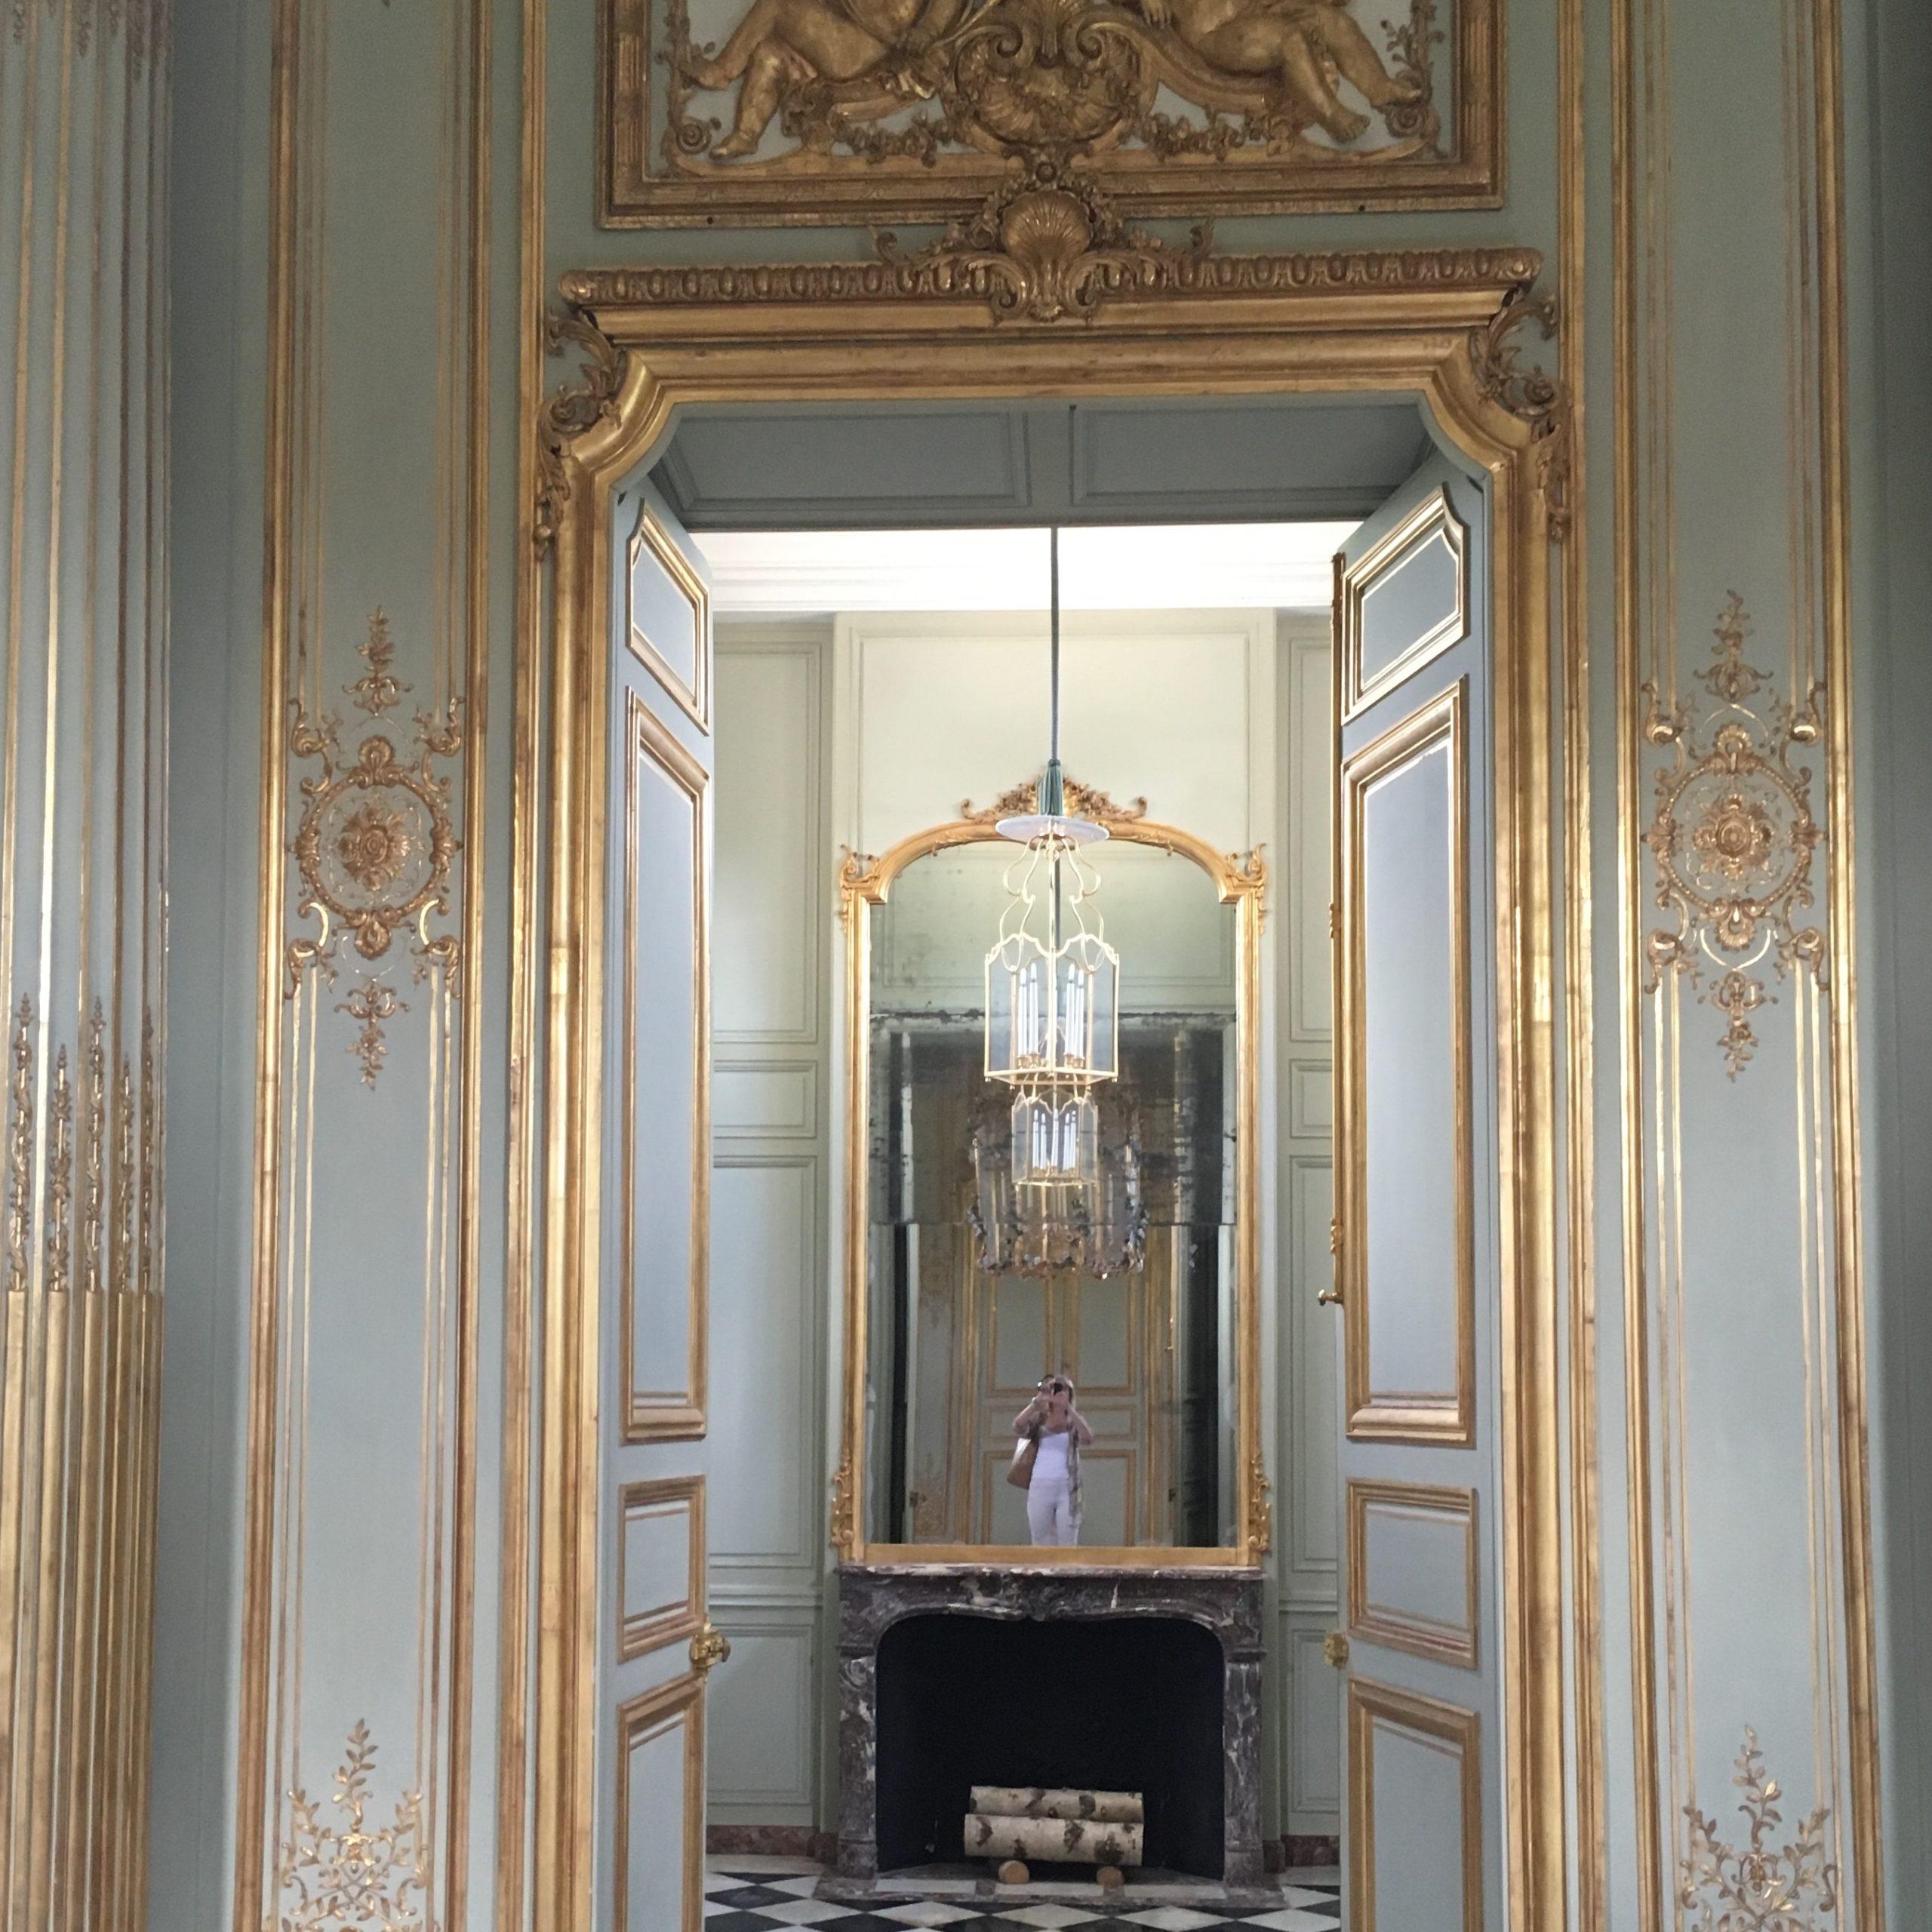 A beautiful mirror seen through a gilded doorway